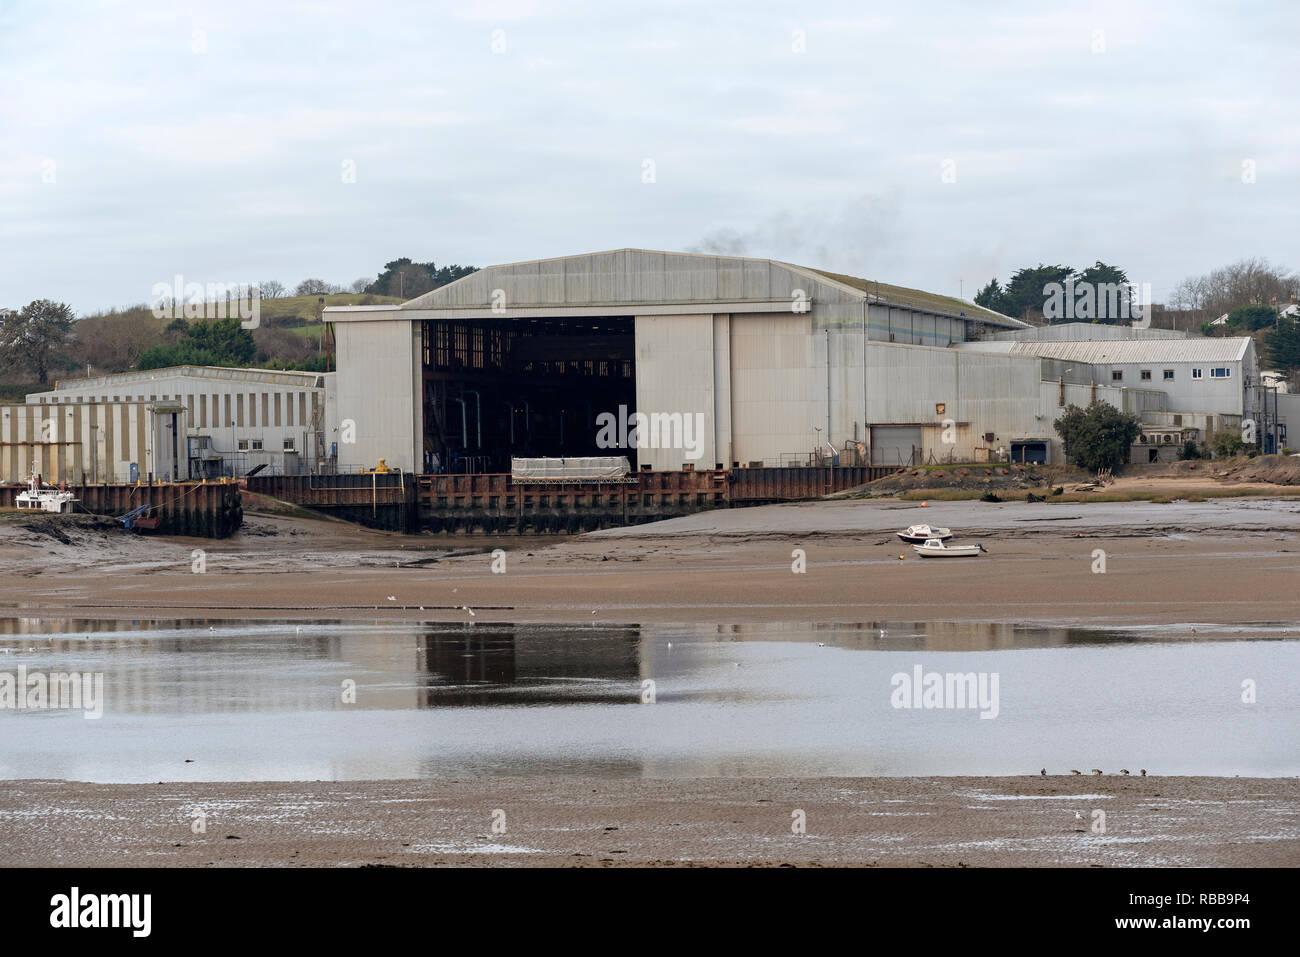 Appledore, North Devon, England UK, January 2019. Shipyard buildings. - Stock Image